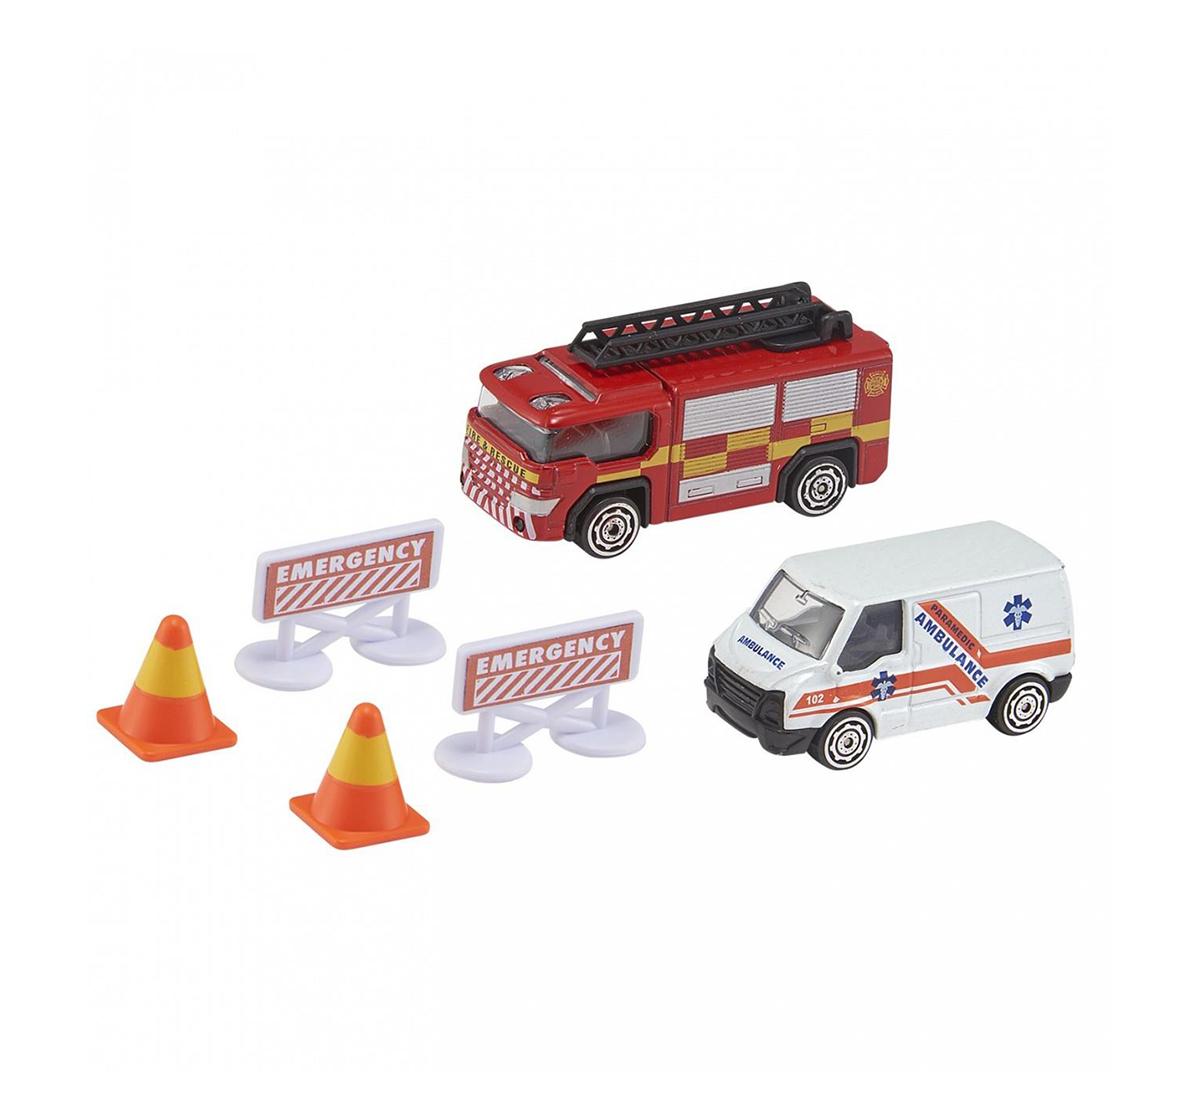 Ralleyz   Ralleyz RESCUE TEAM HELI & AMBULNCE Vehicles for Kids age 3Y+